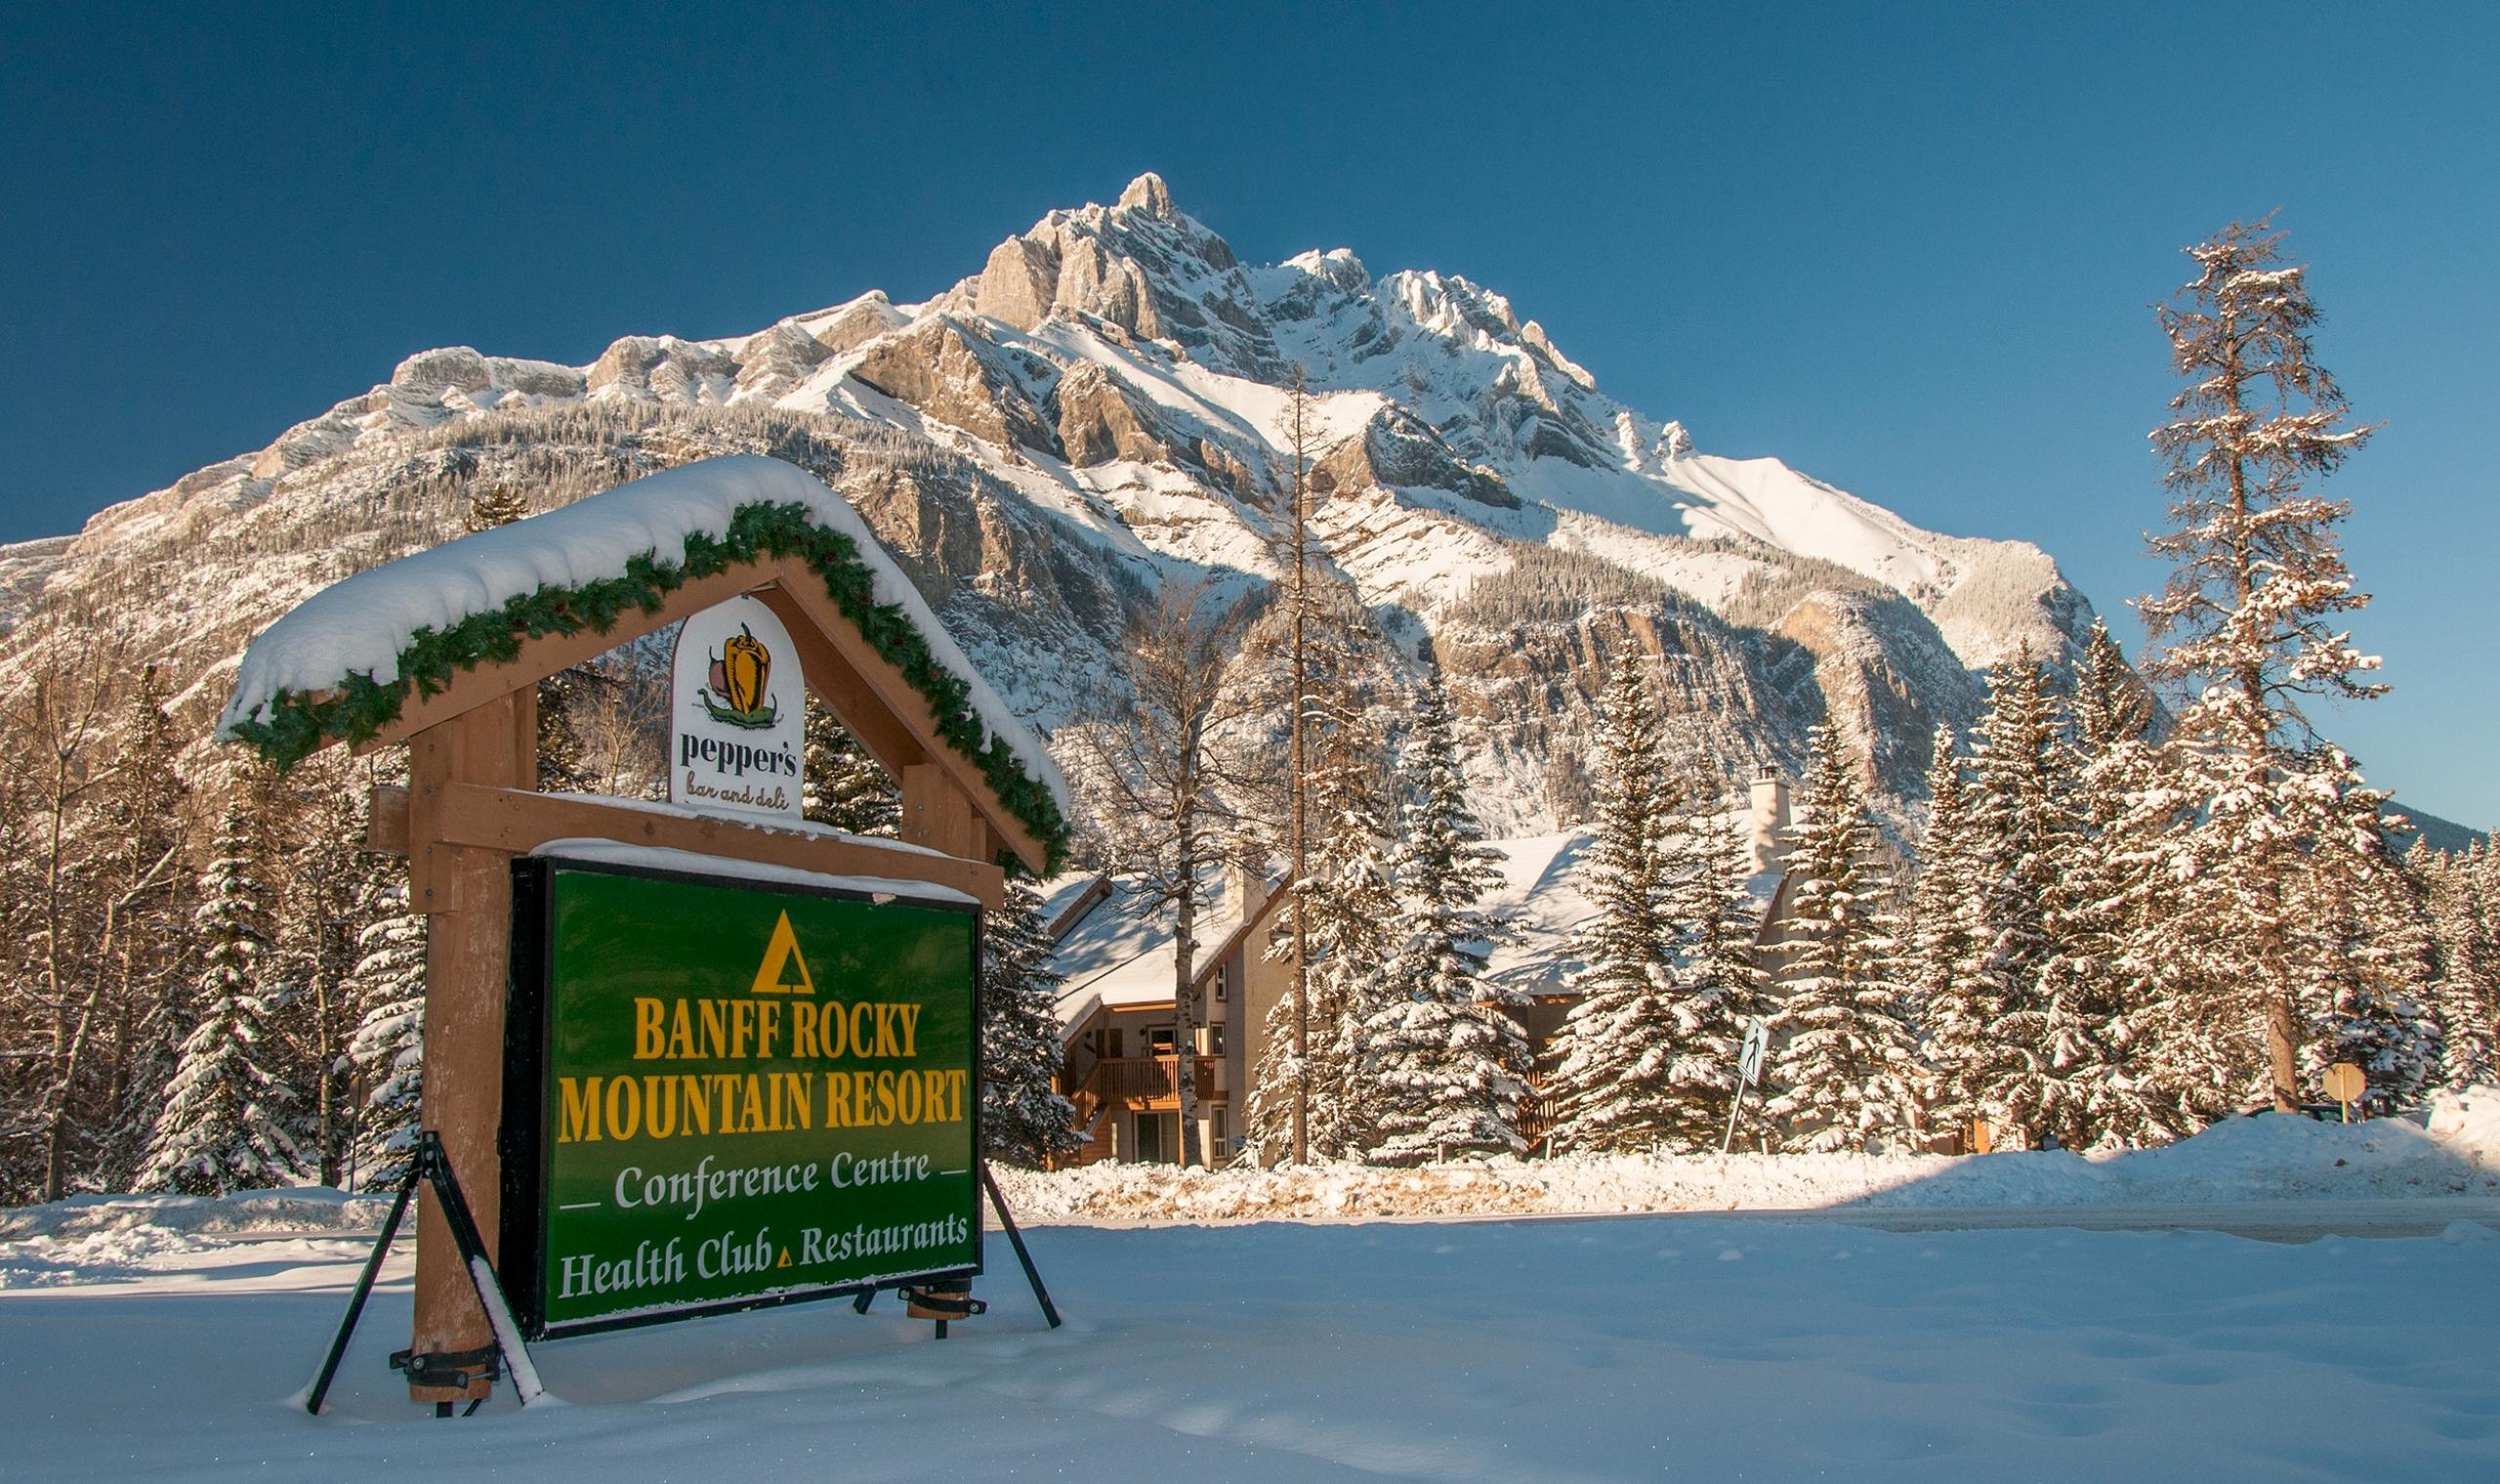 Banff Rocky Mountain Resort Banff Canadian Affair